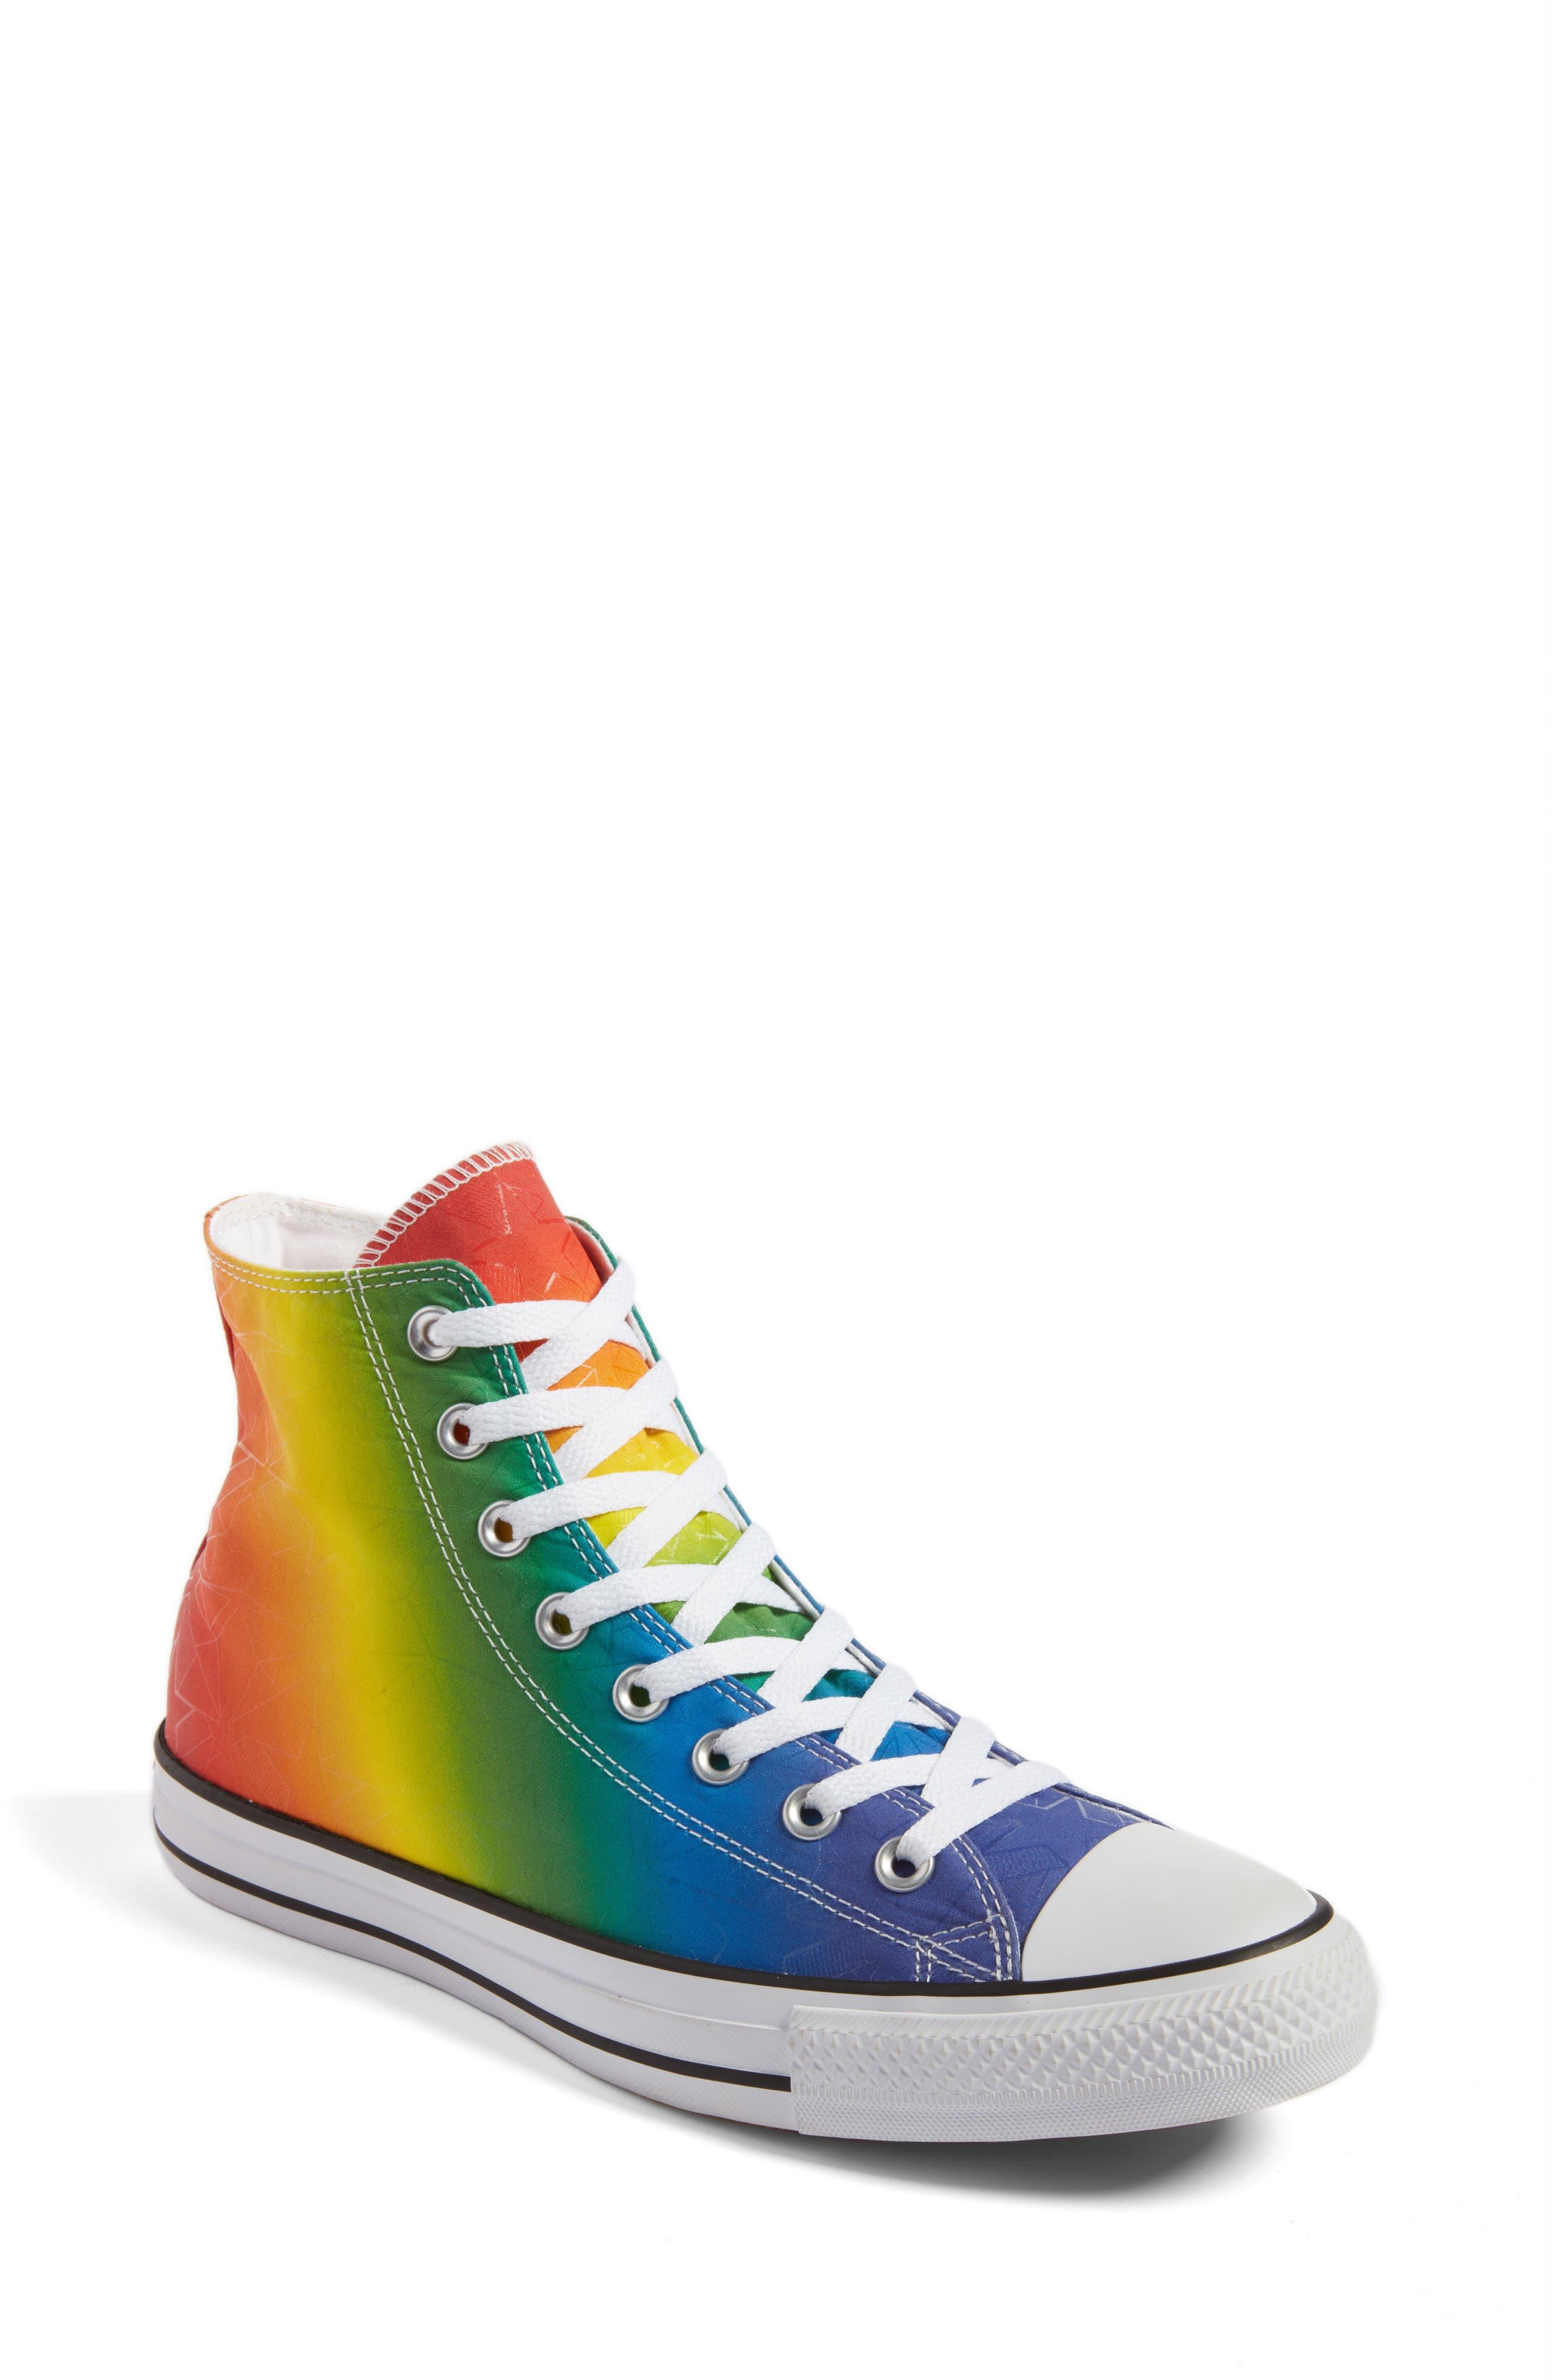 Main Image - Converse Chuck Taylor® All Star® Pride High Top Sneaker (Women)